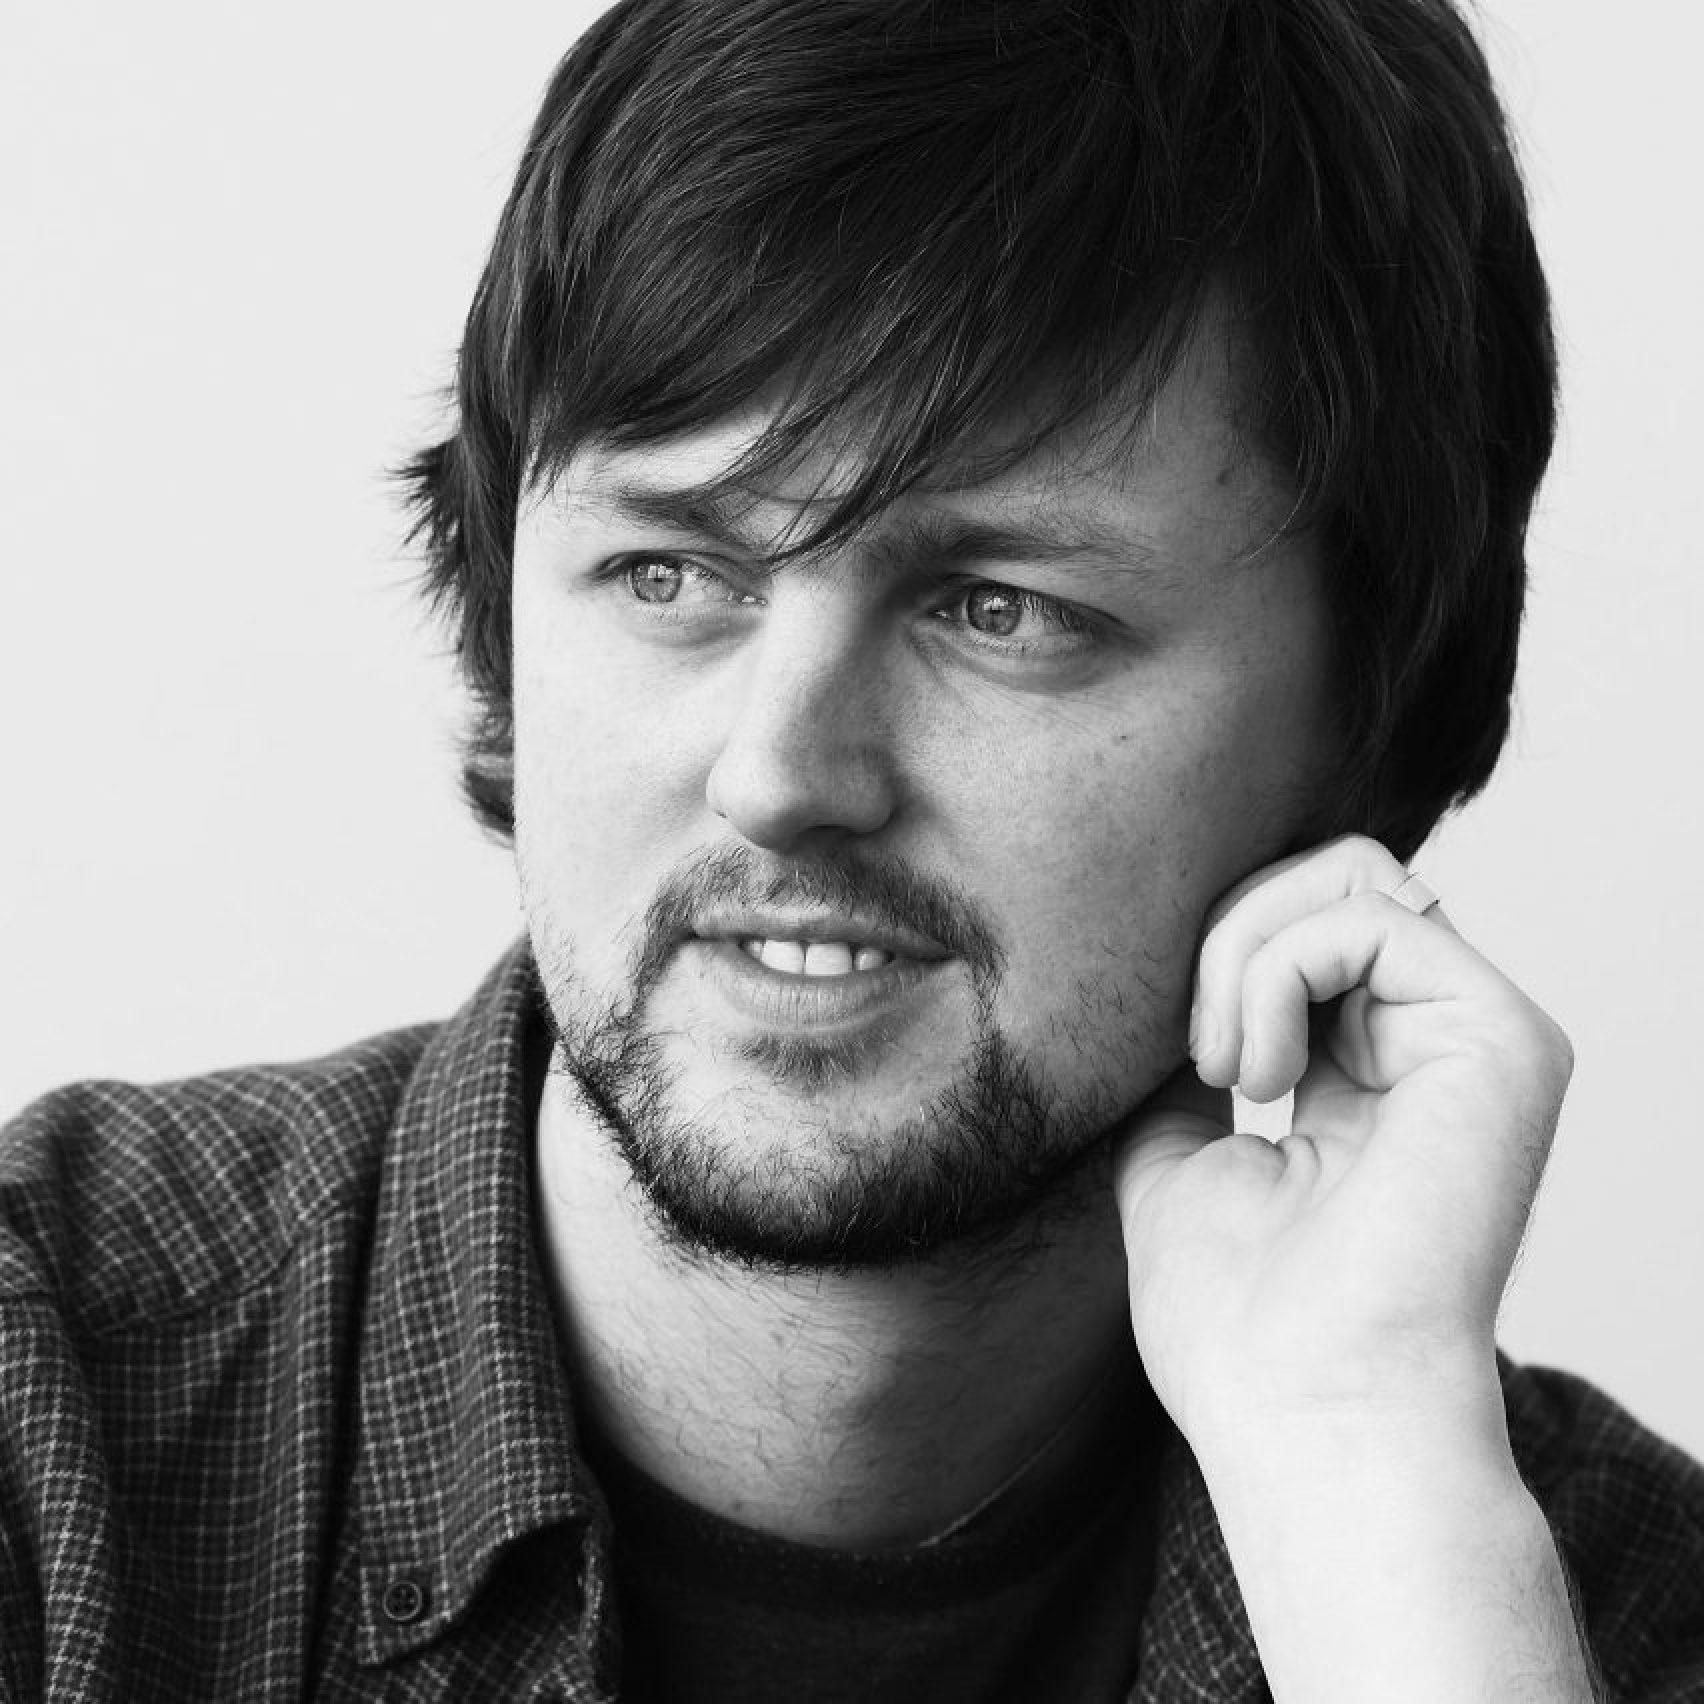 Portrait of Adam Laskey, director of Marraum